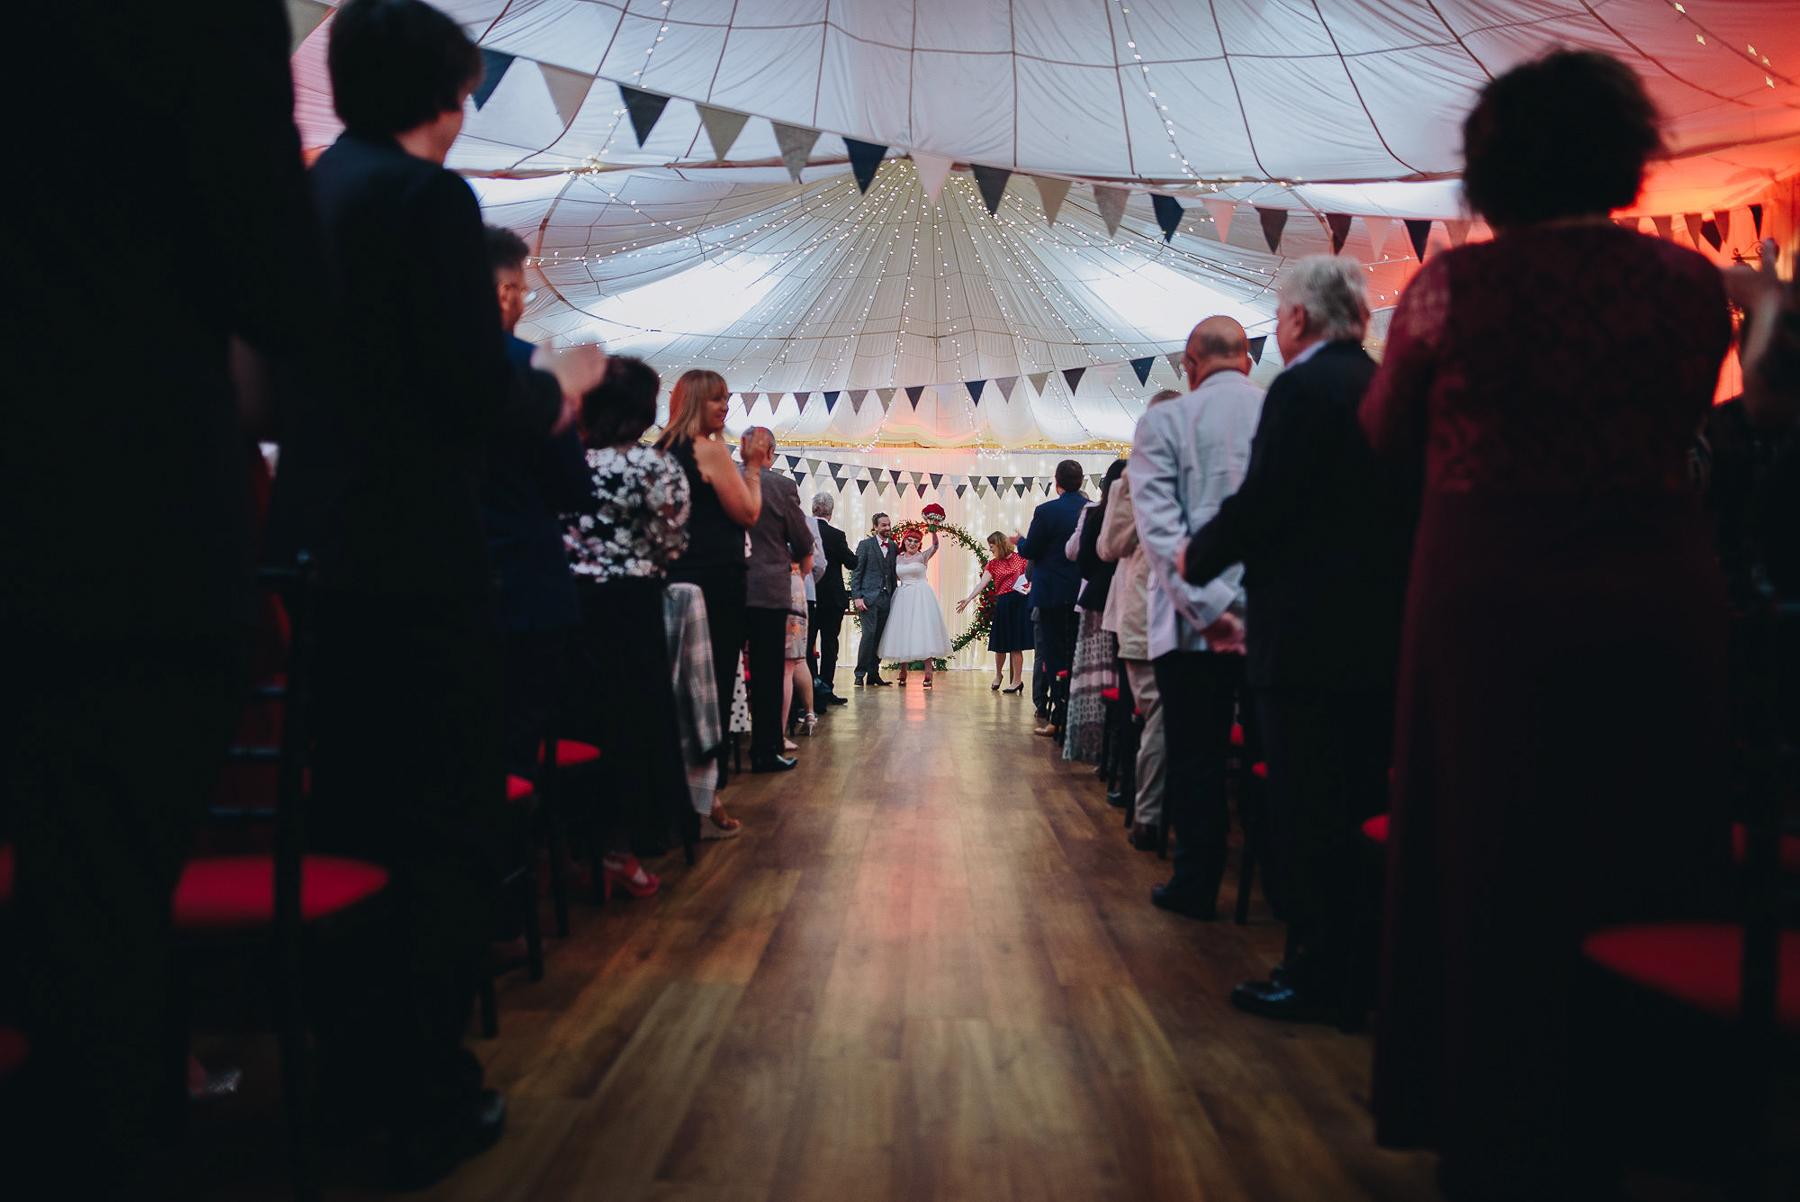 Wellbeing_Farm_Wedding_Photography_The_Pin-Up_Bride_Lara_Shaun-71.jpg